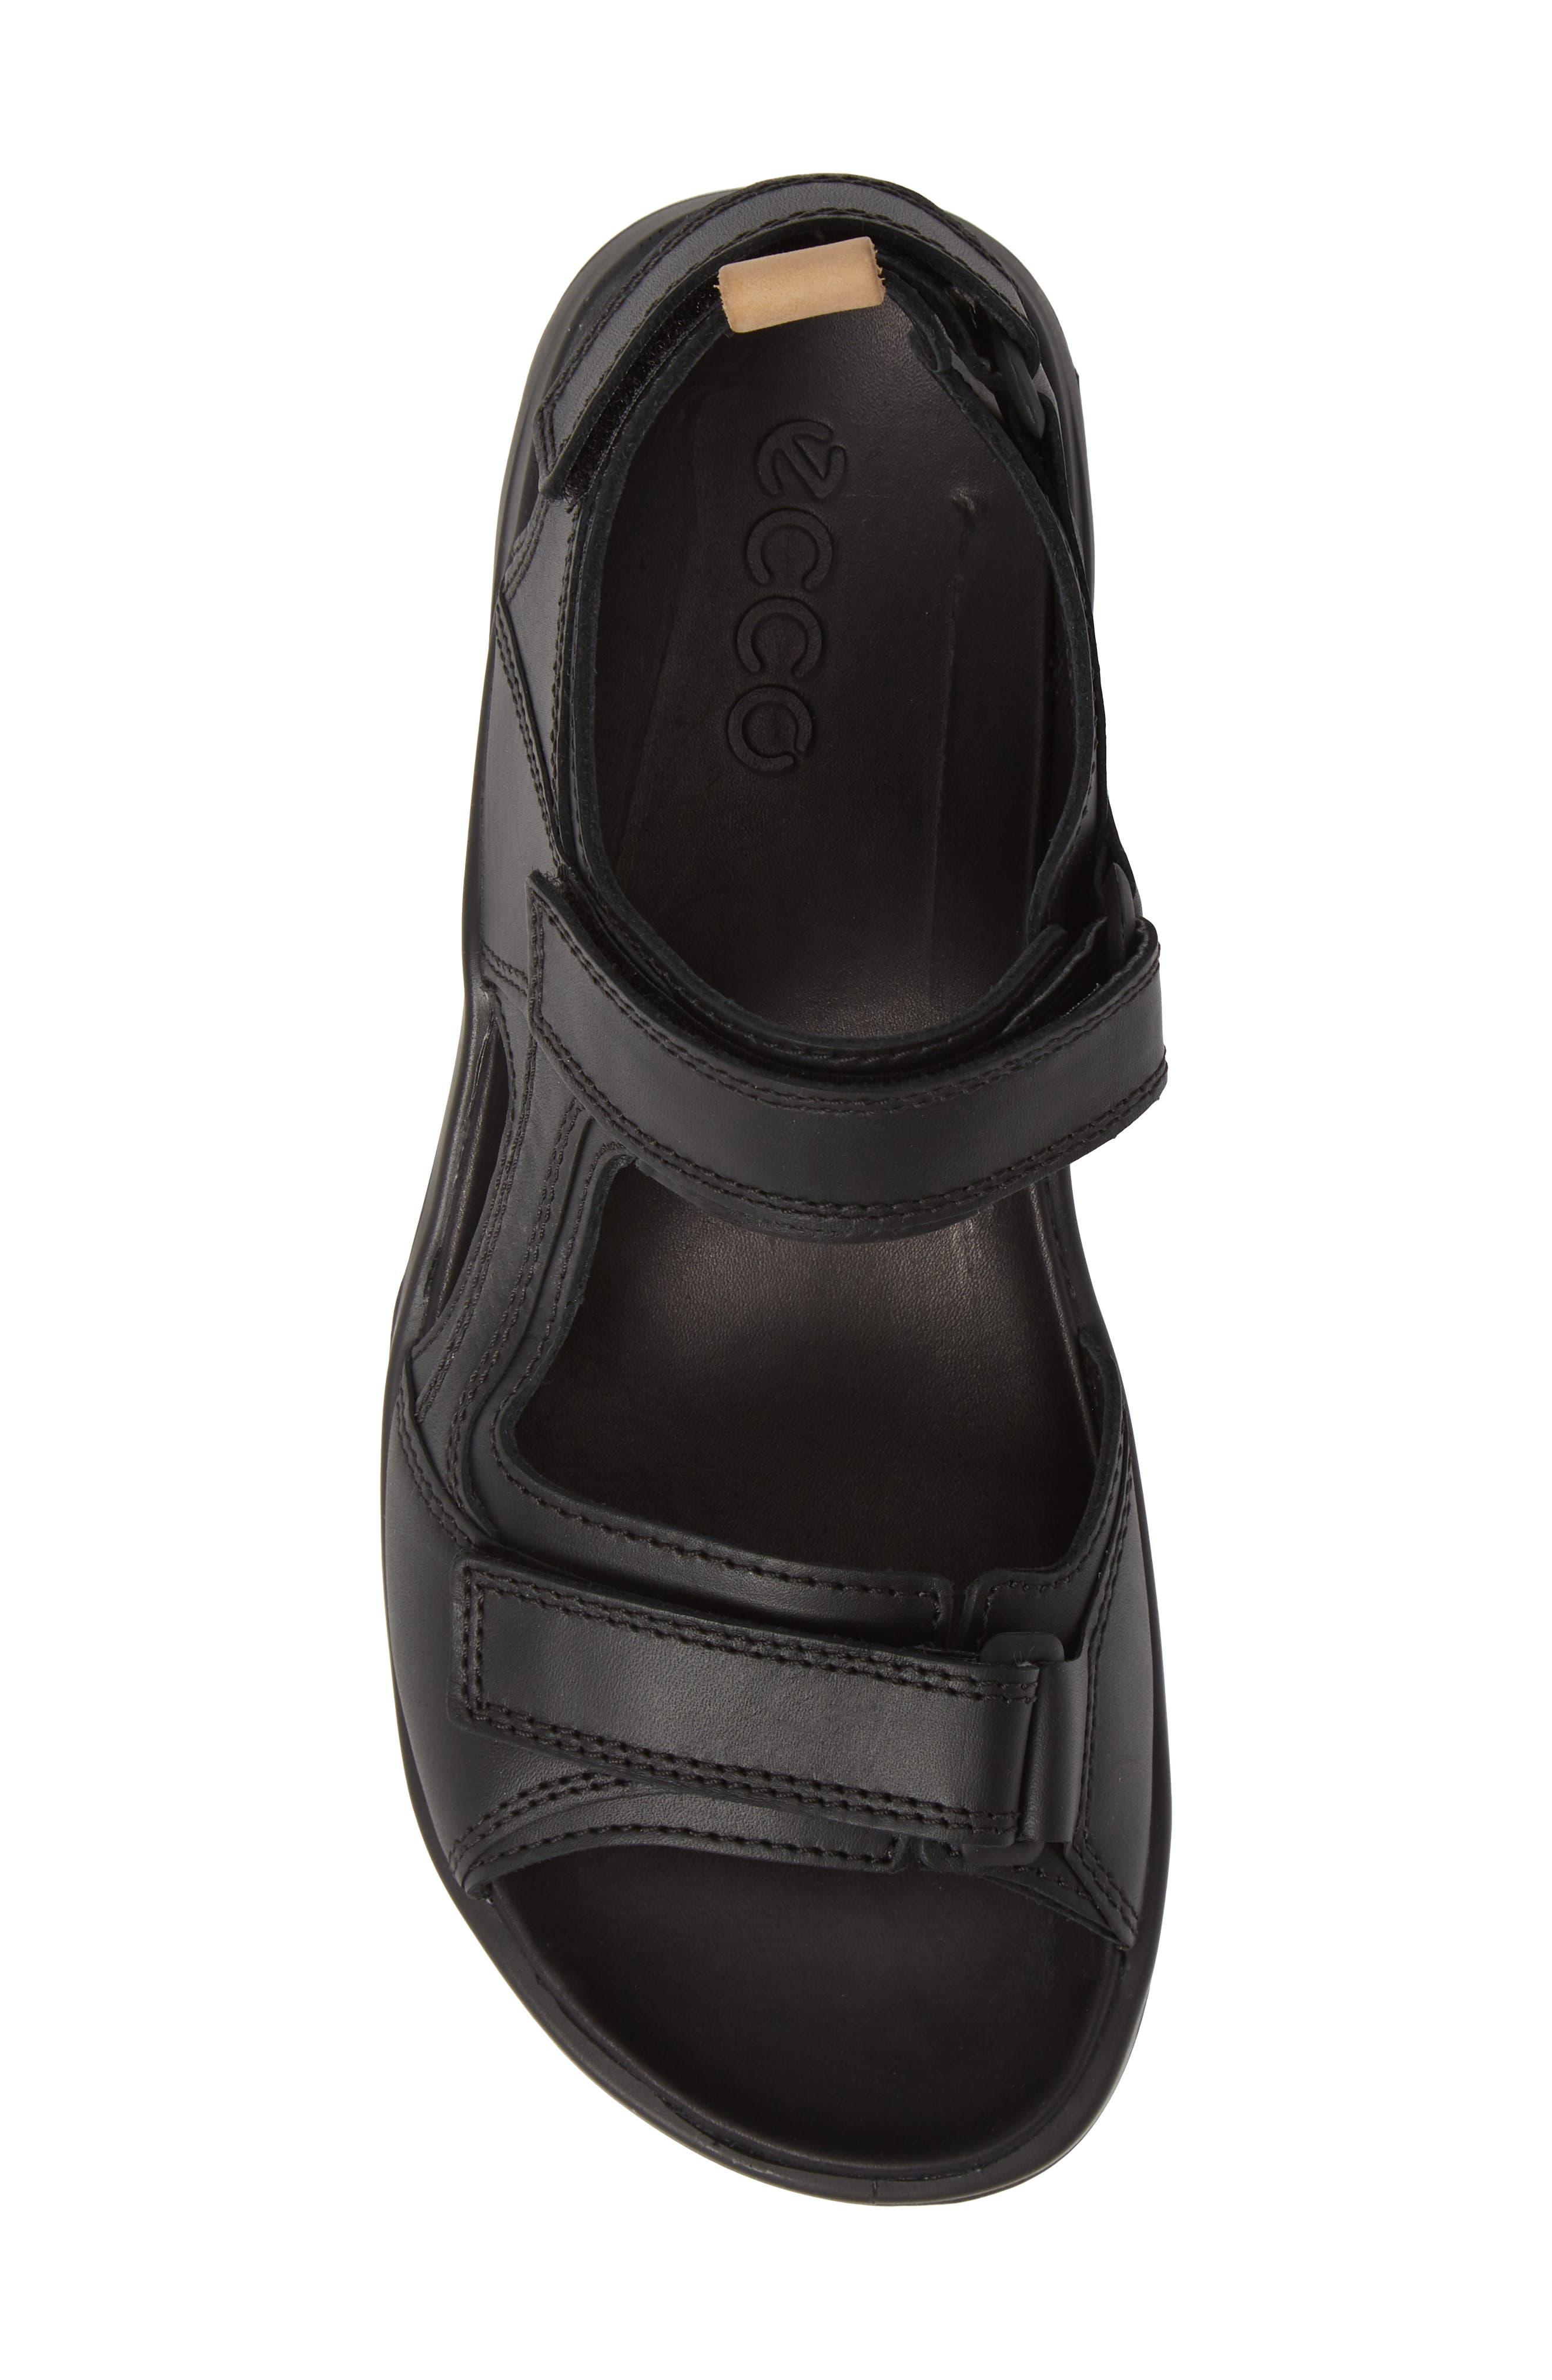 Premium Offroad Sandal,                             Alternate thumbnail 5, color,                             BLACK LEATHER